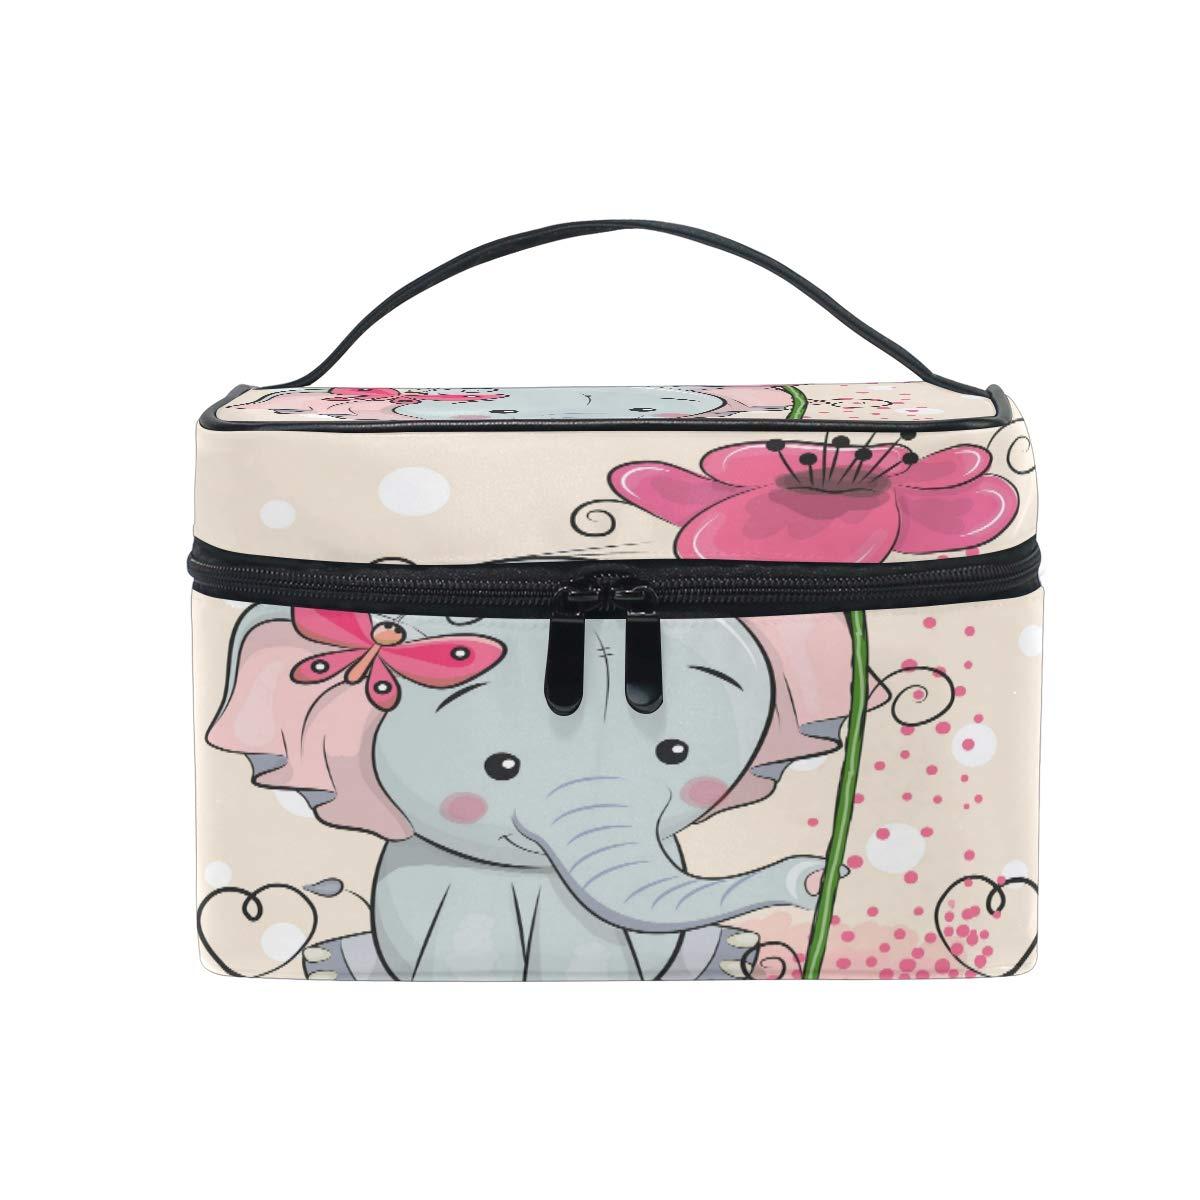 BIGJOKE Makeup Bag, Cute Elephant Flower Portable Travel